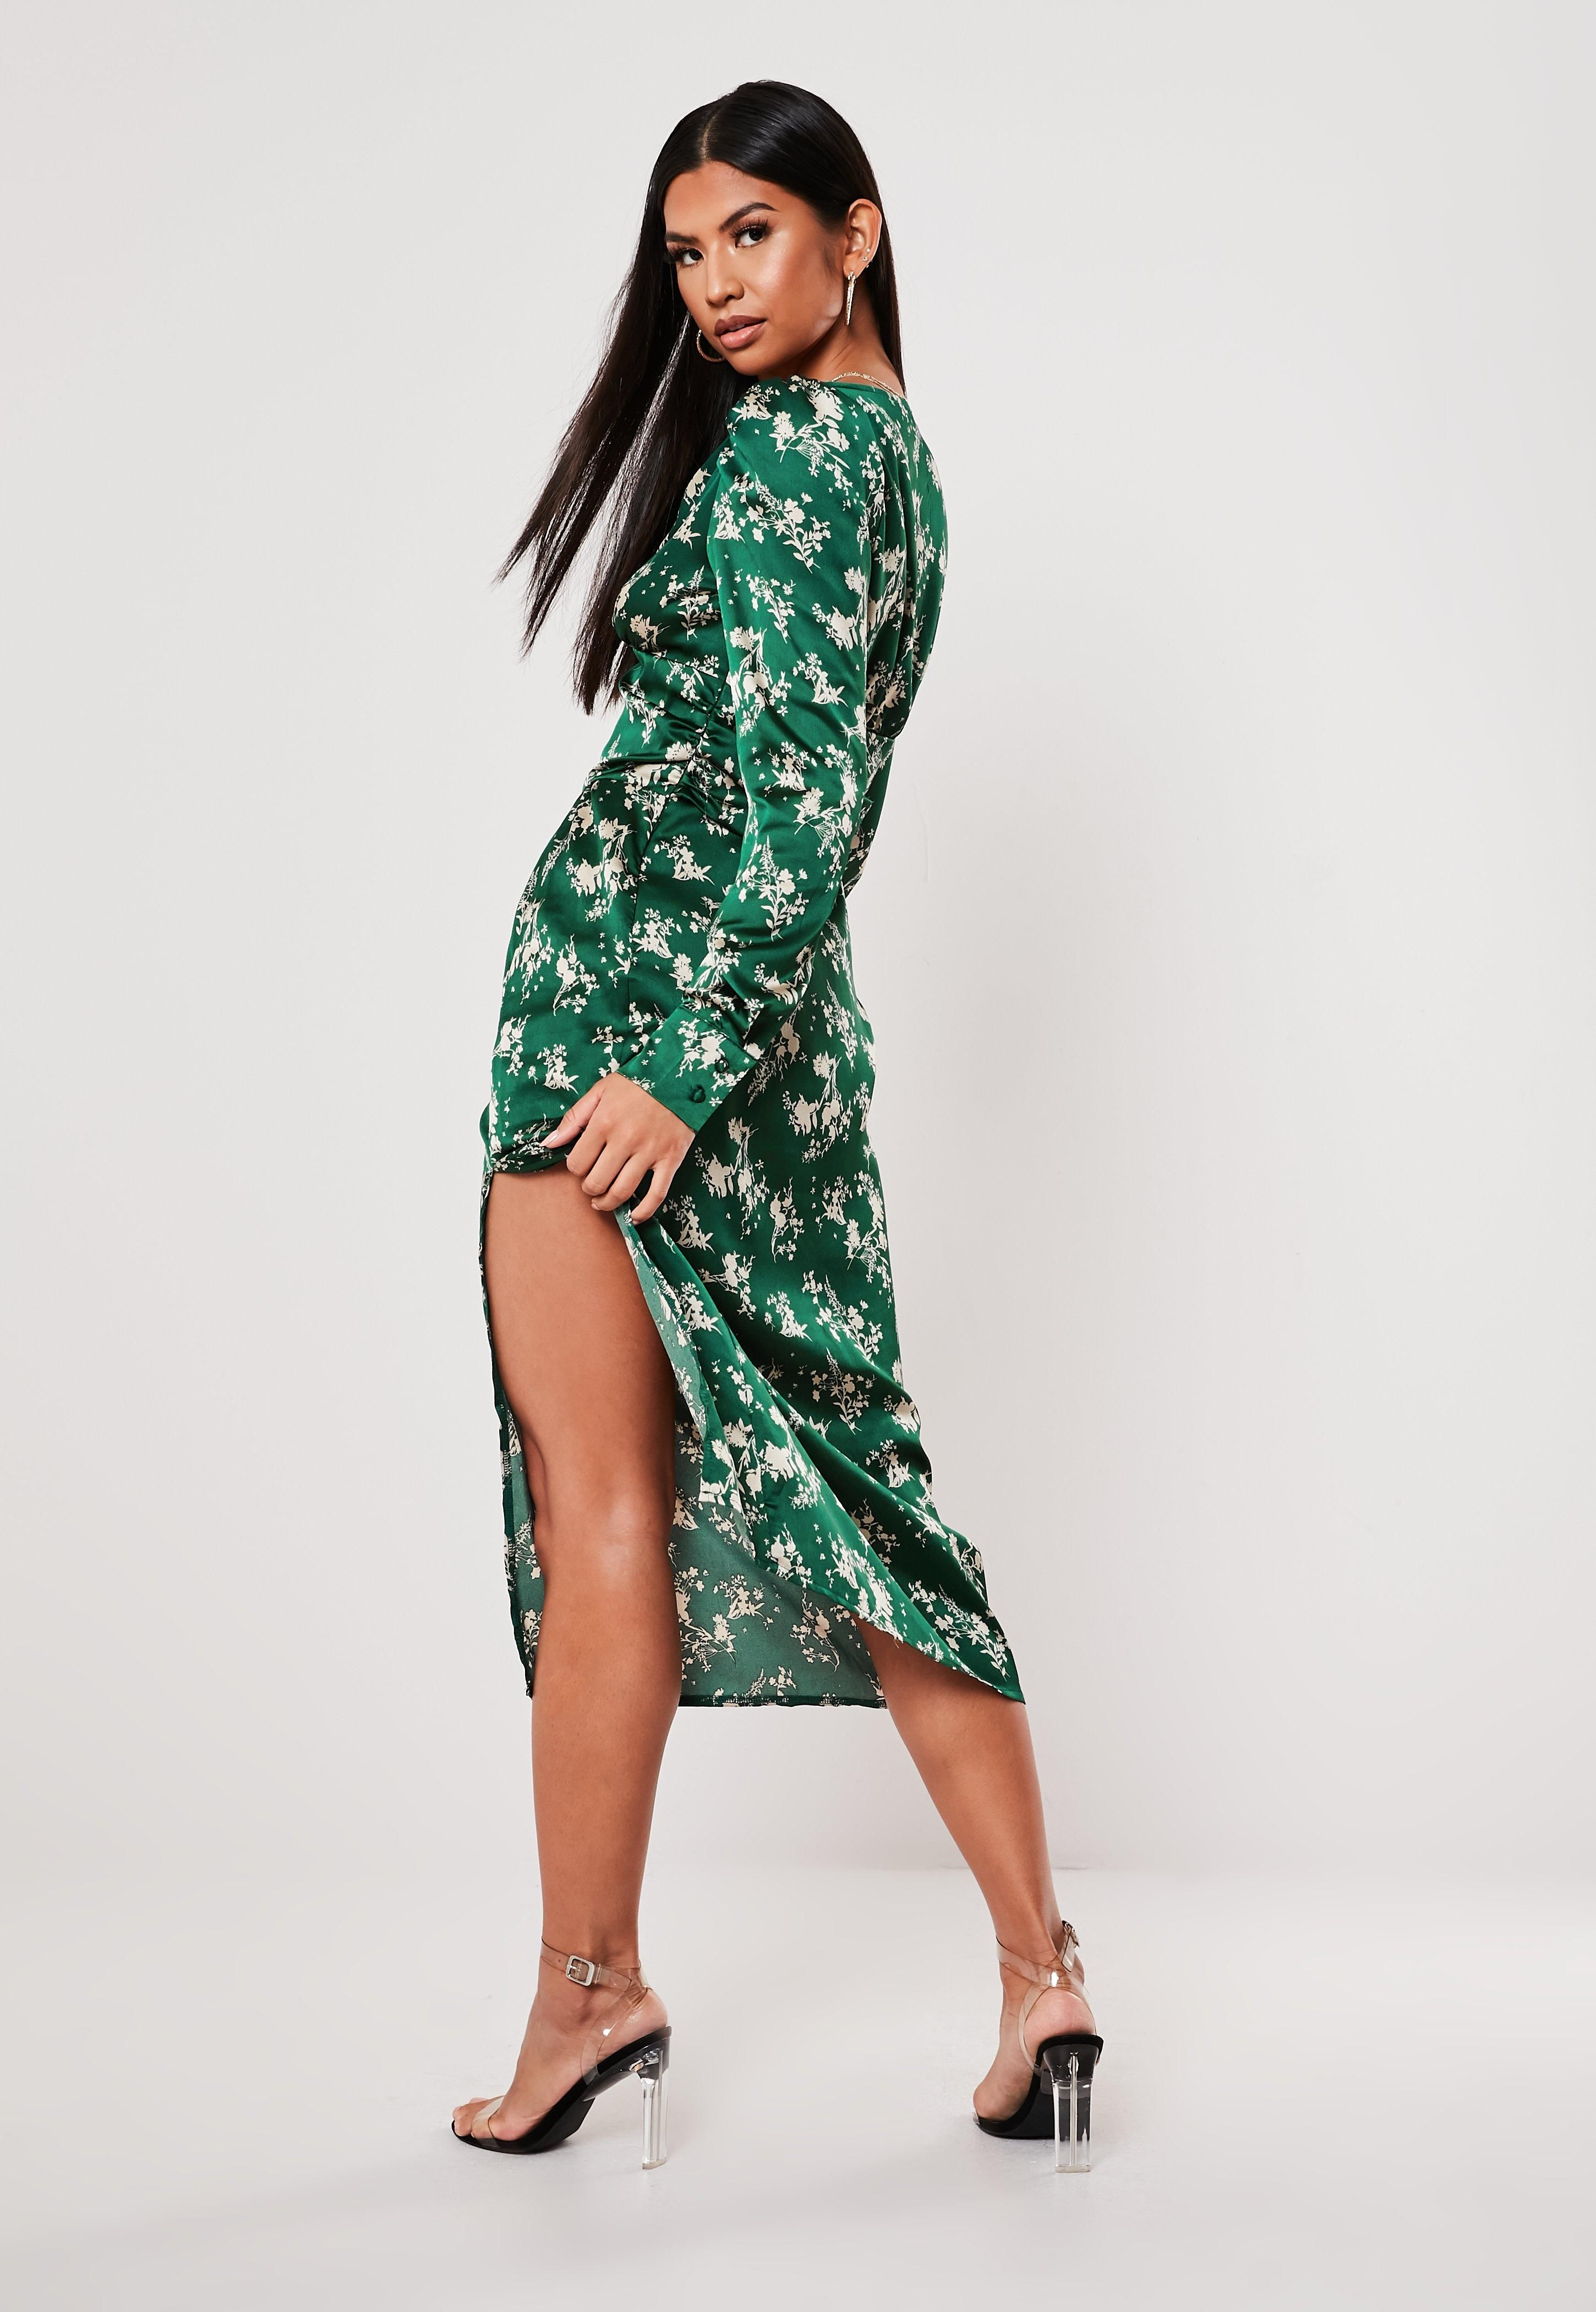 Green Floral Puff Sleeve Midi Dress Sponsored Puff Sponsored Floral Green Womens Dresses Puff Sleeve Midi Dresses Dresses [ 4200 x 2900 Pixel ]